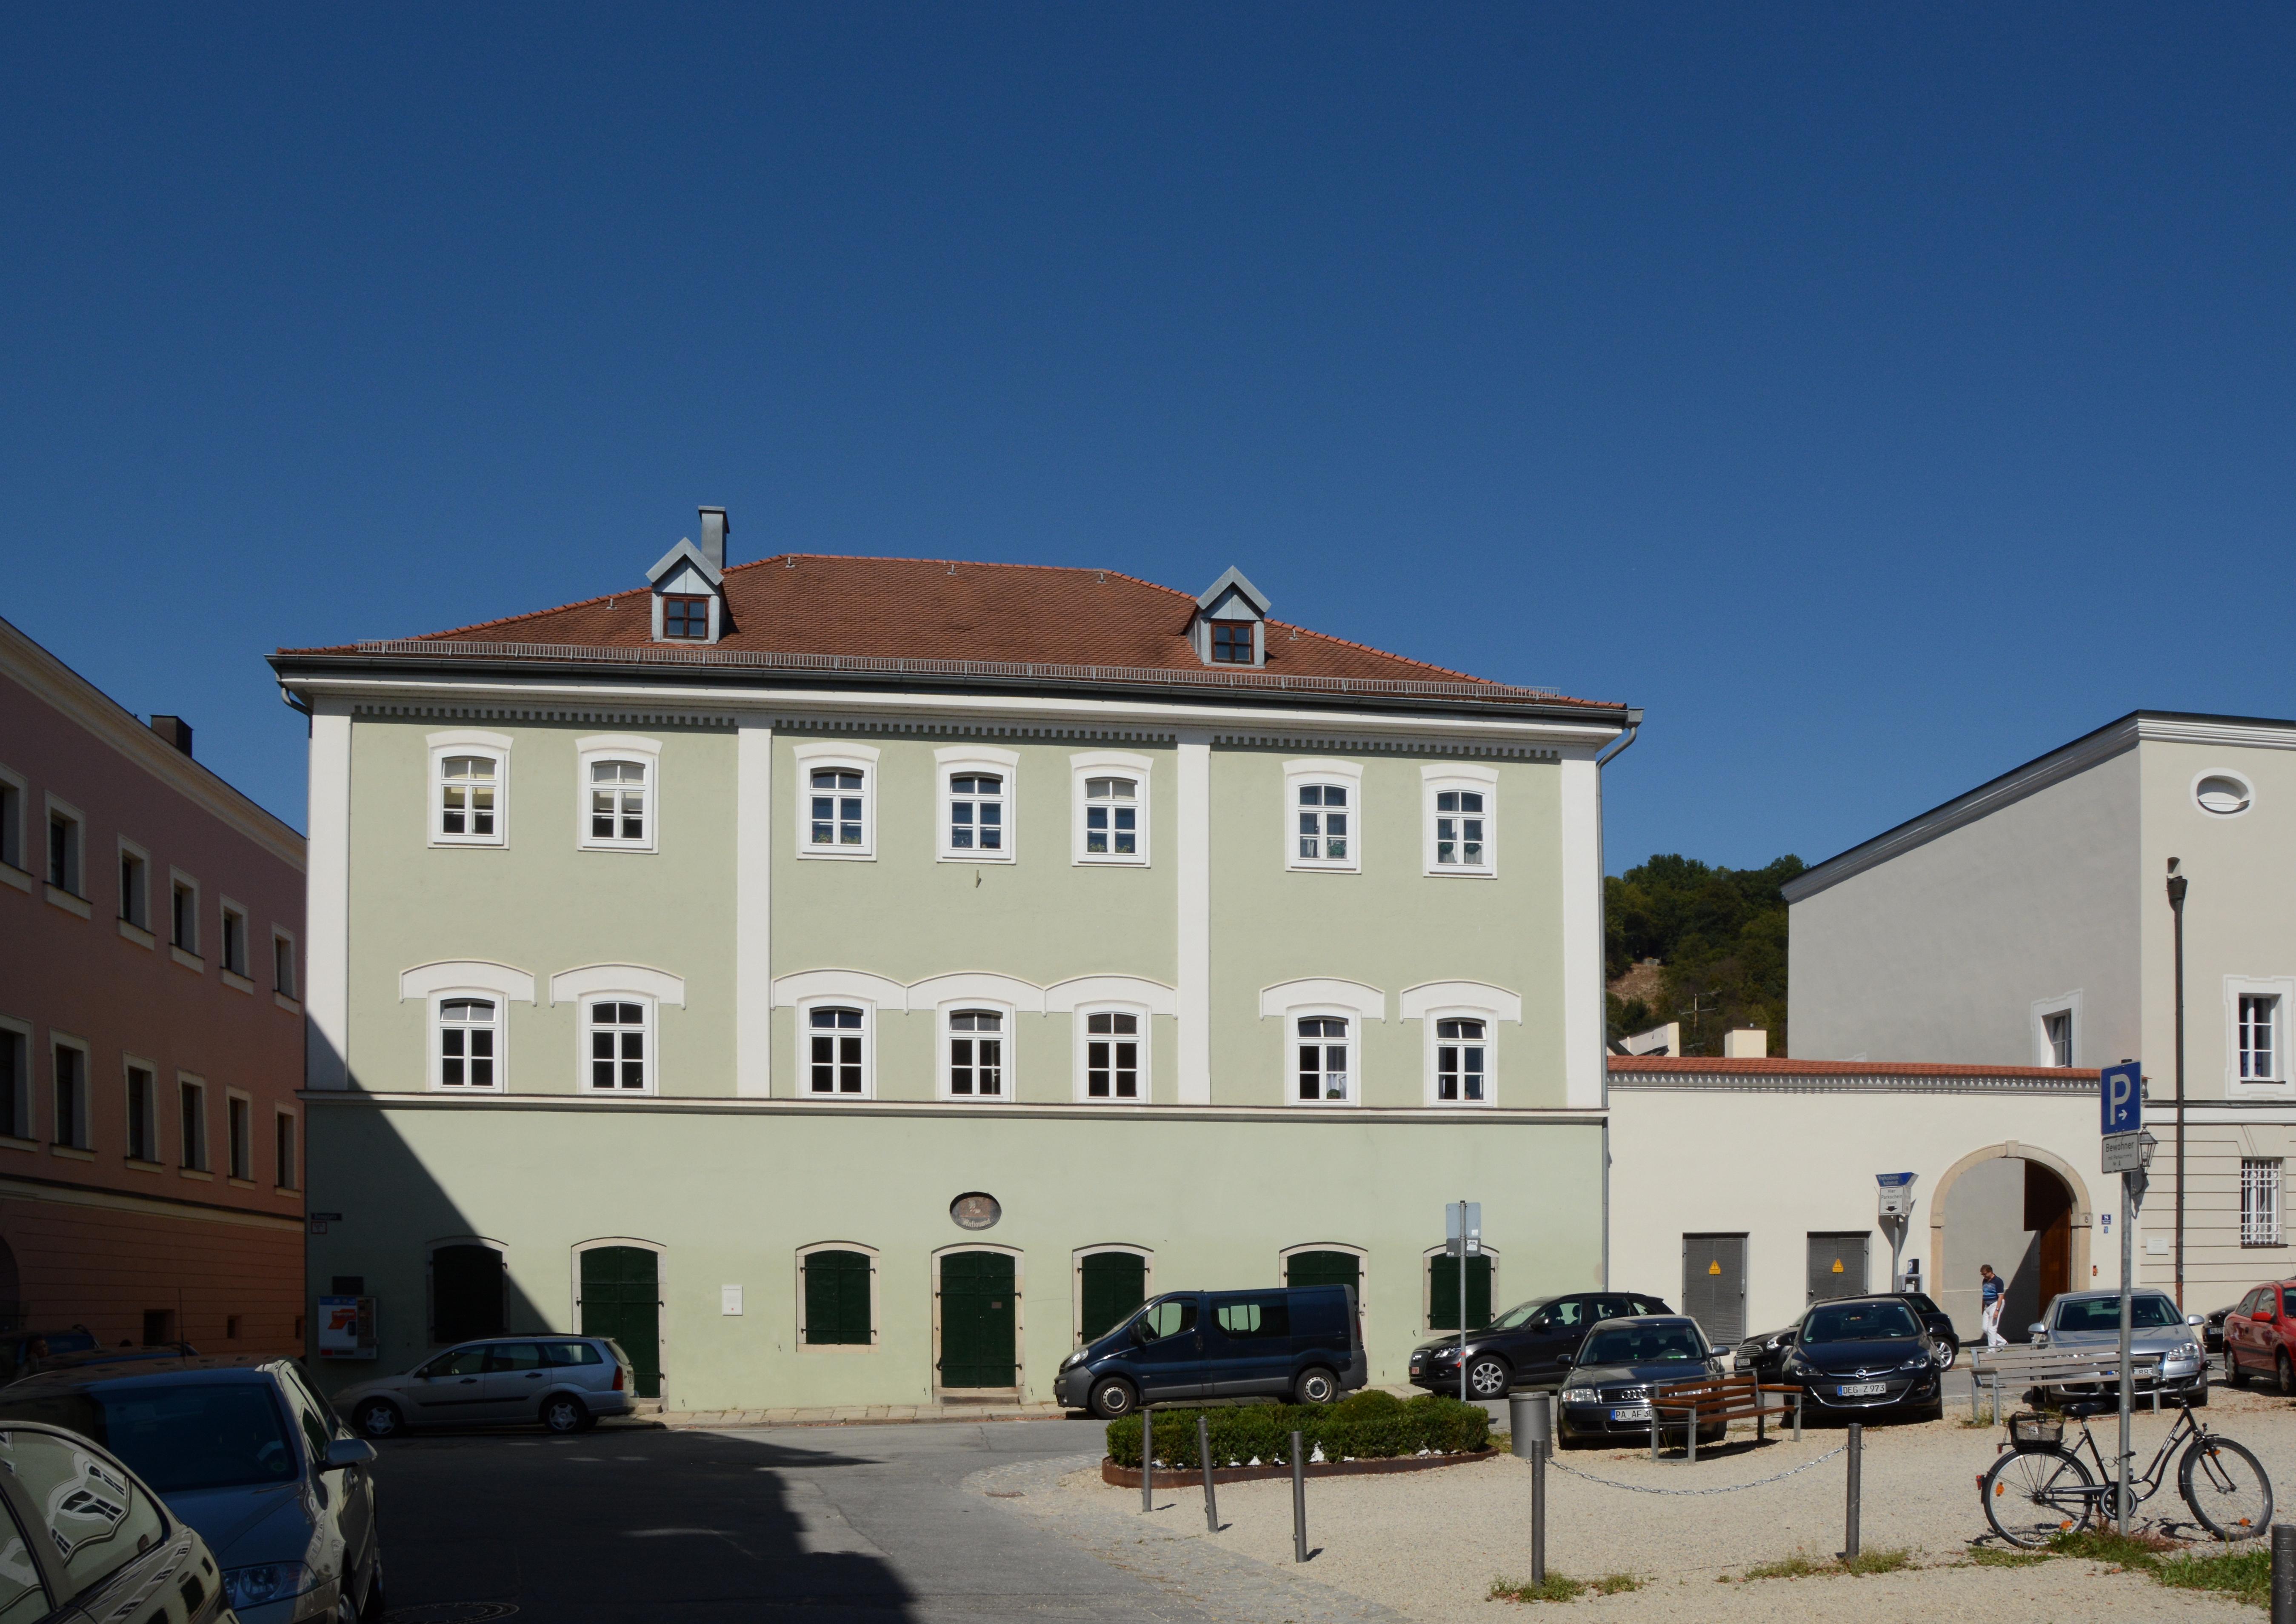 Fileluragogasse 5 Passau Cjpg Wikimedia Commons